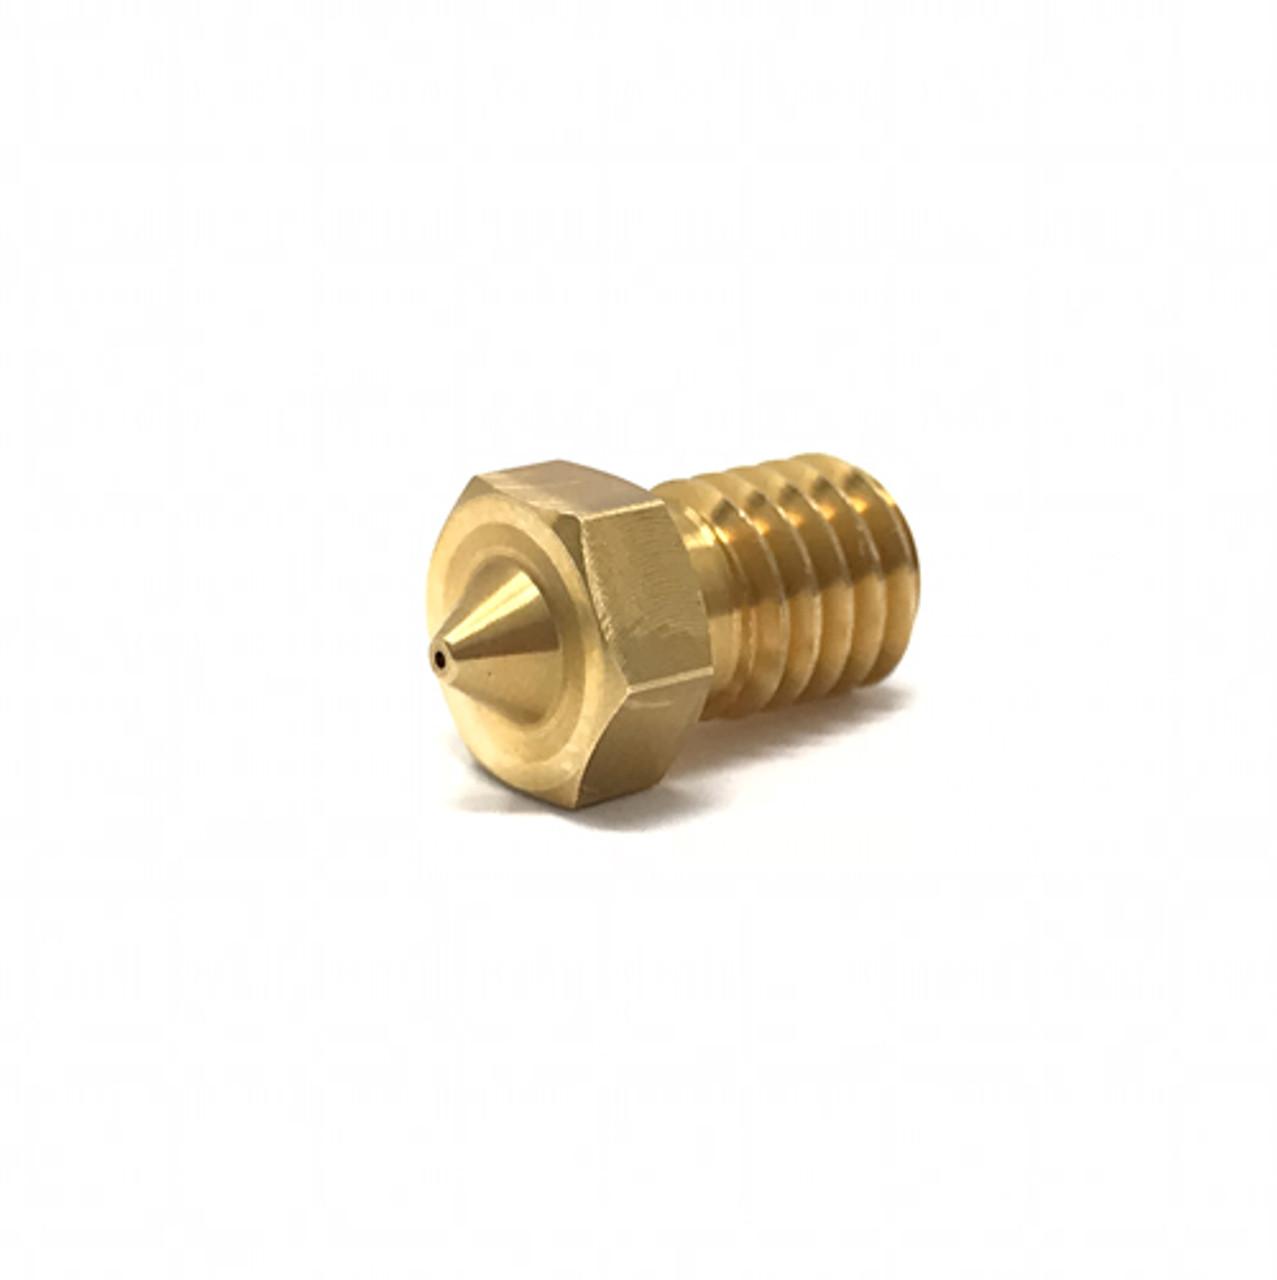 E3D V6 Brass Nozzle Triple Pack 1.75mm, 0.4mm